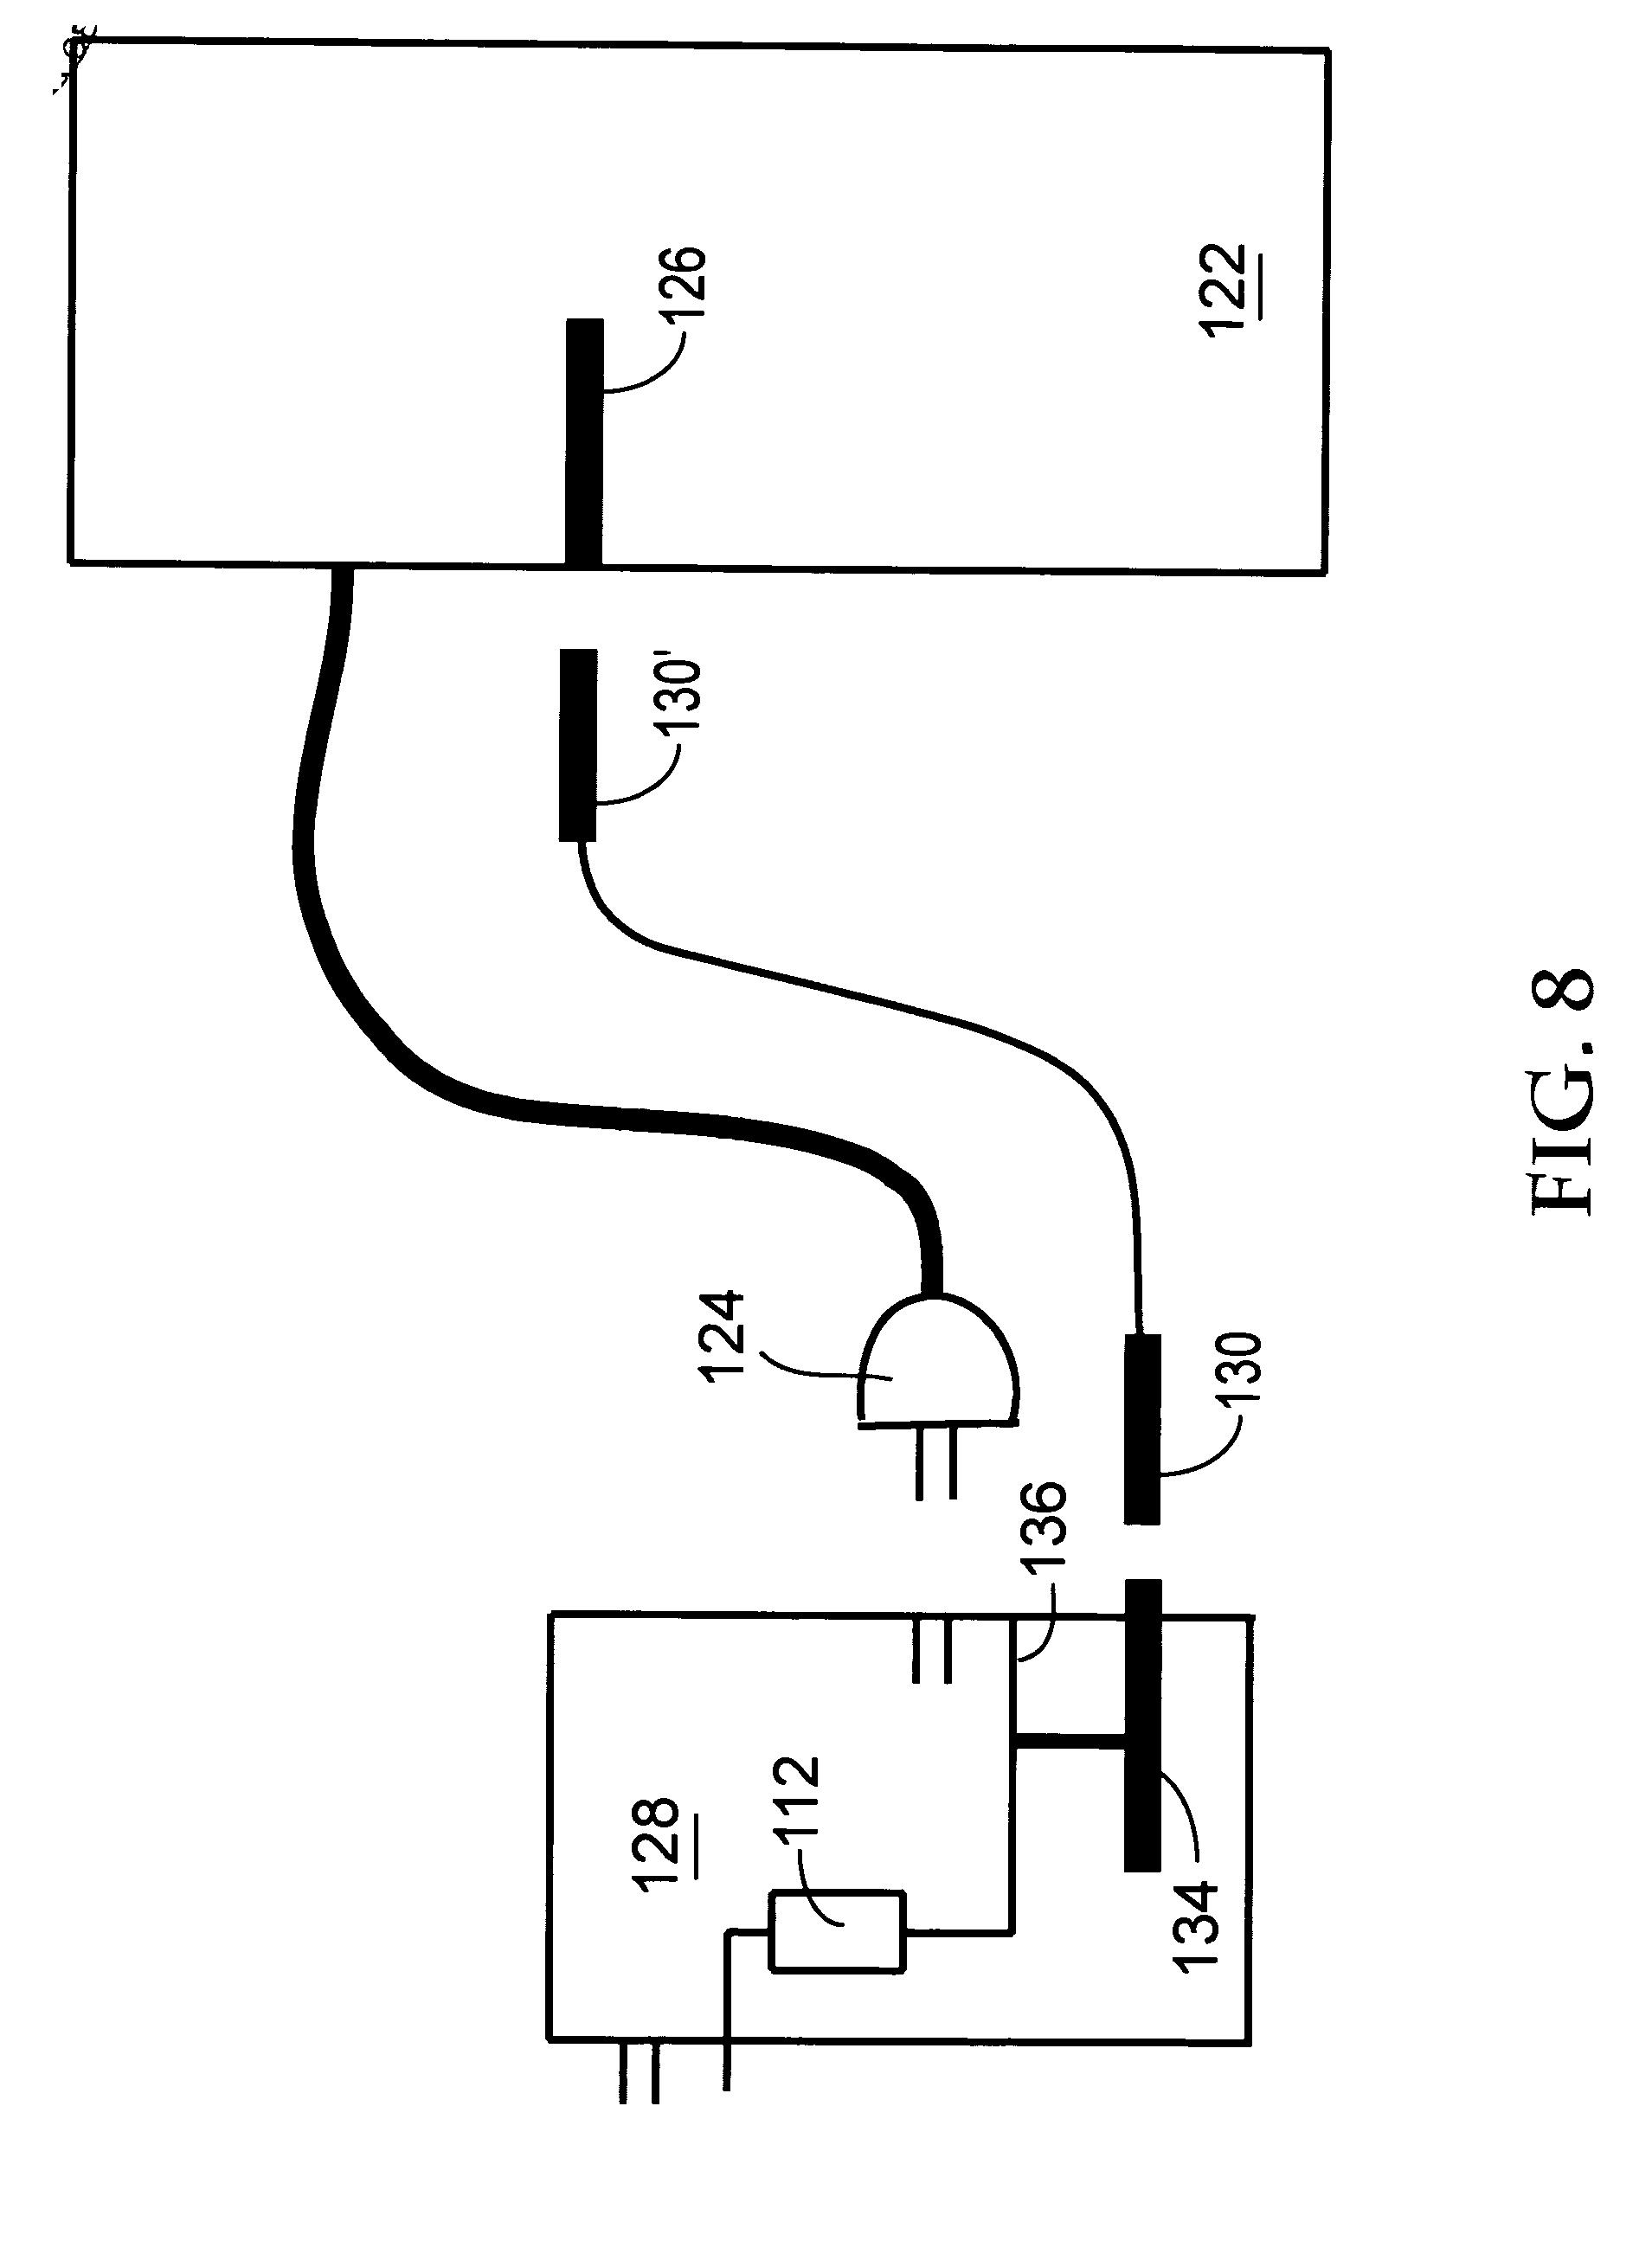 ground loop isolator schematic  | elsalvadorla.org